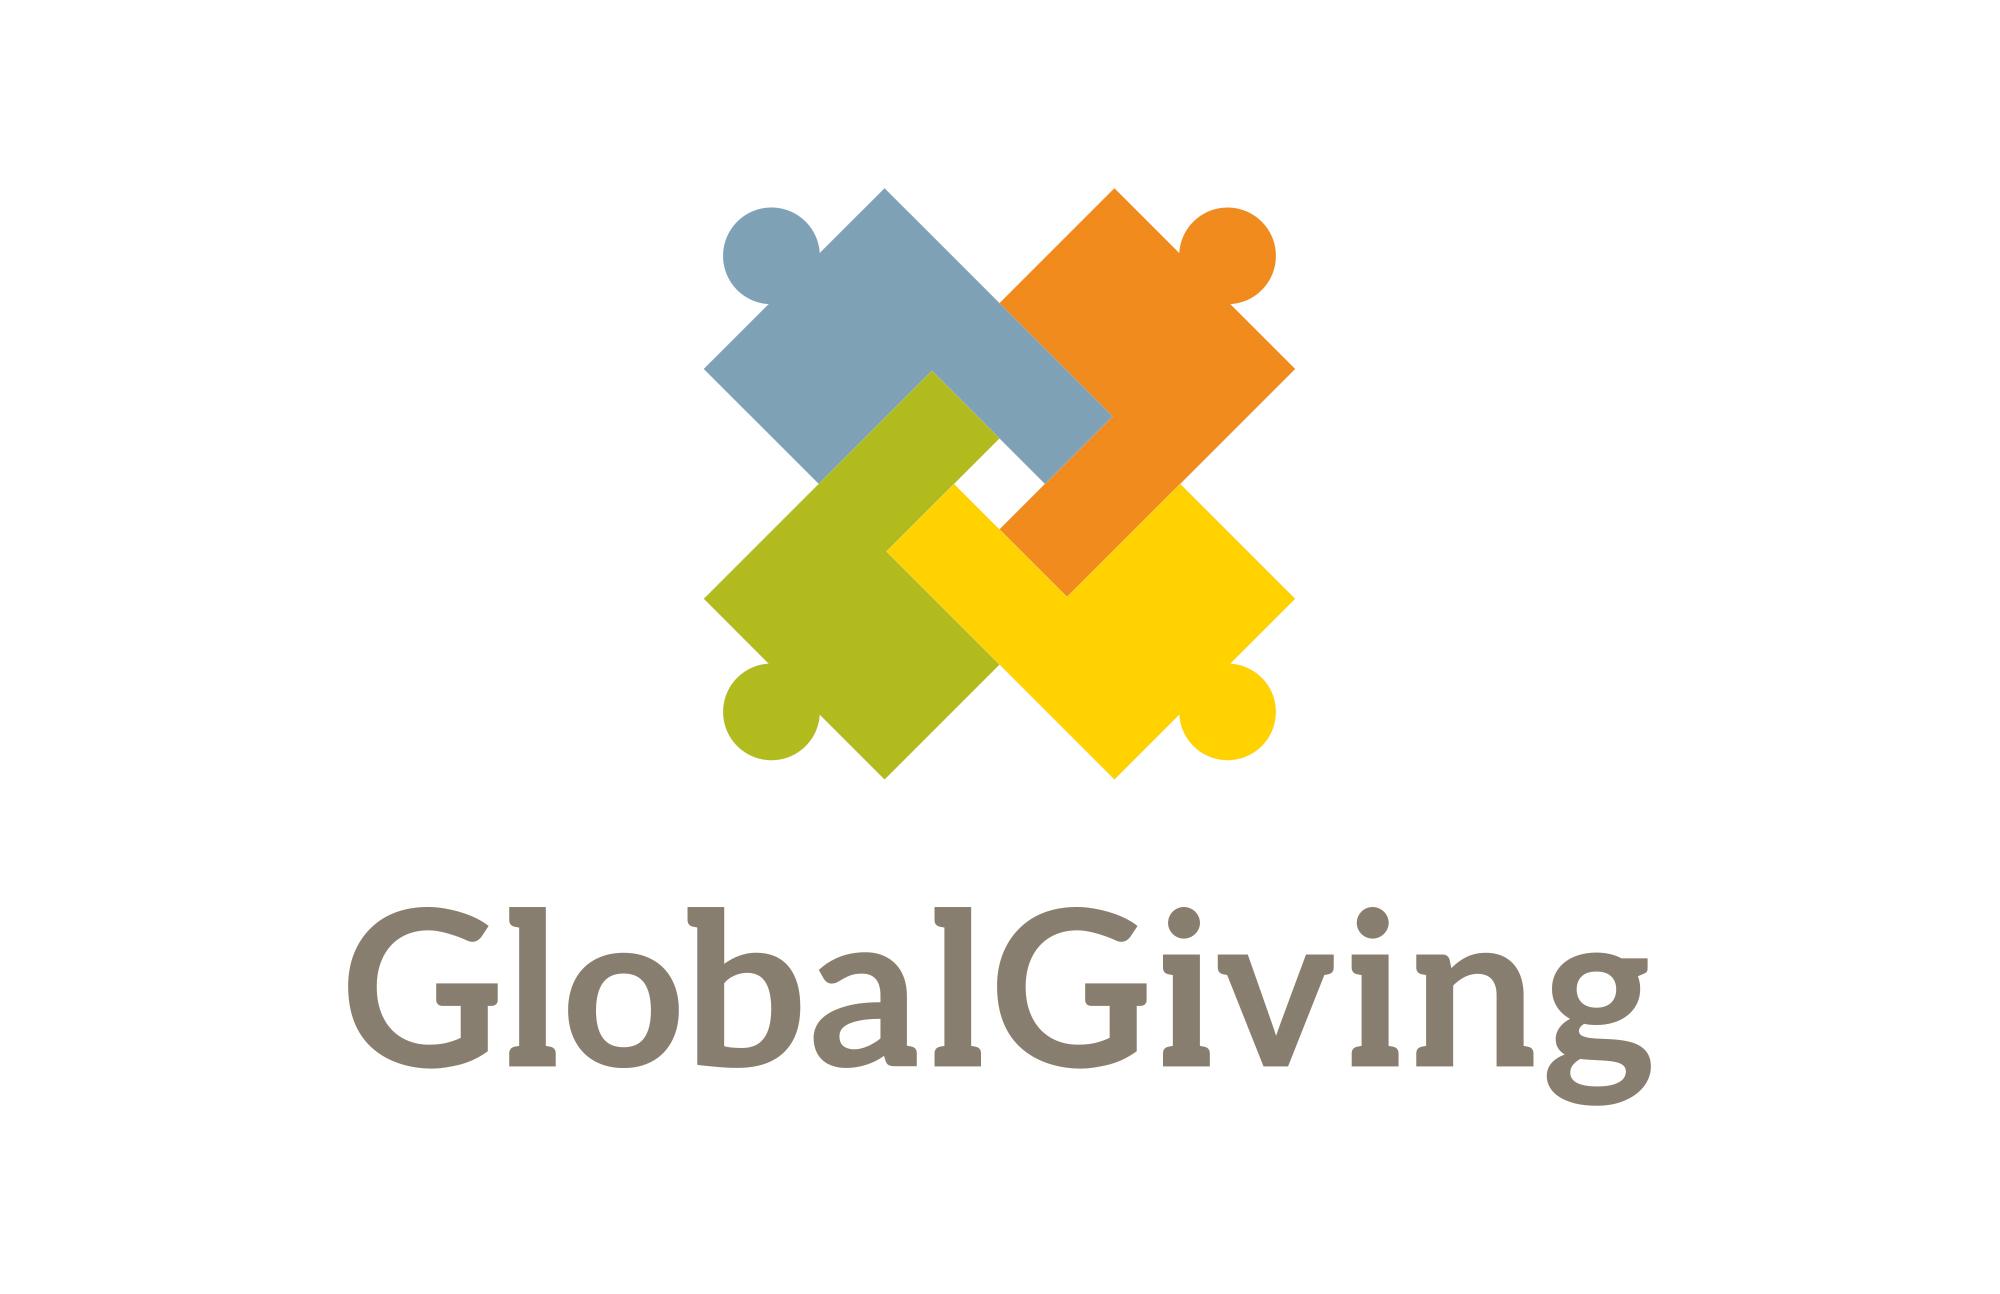 GlobalGiving Case Study